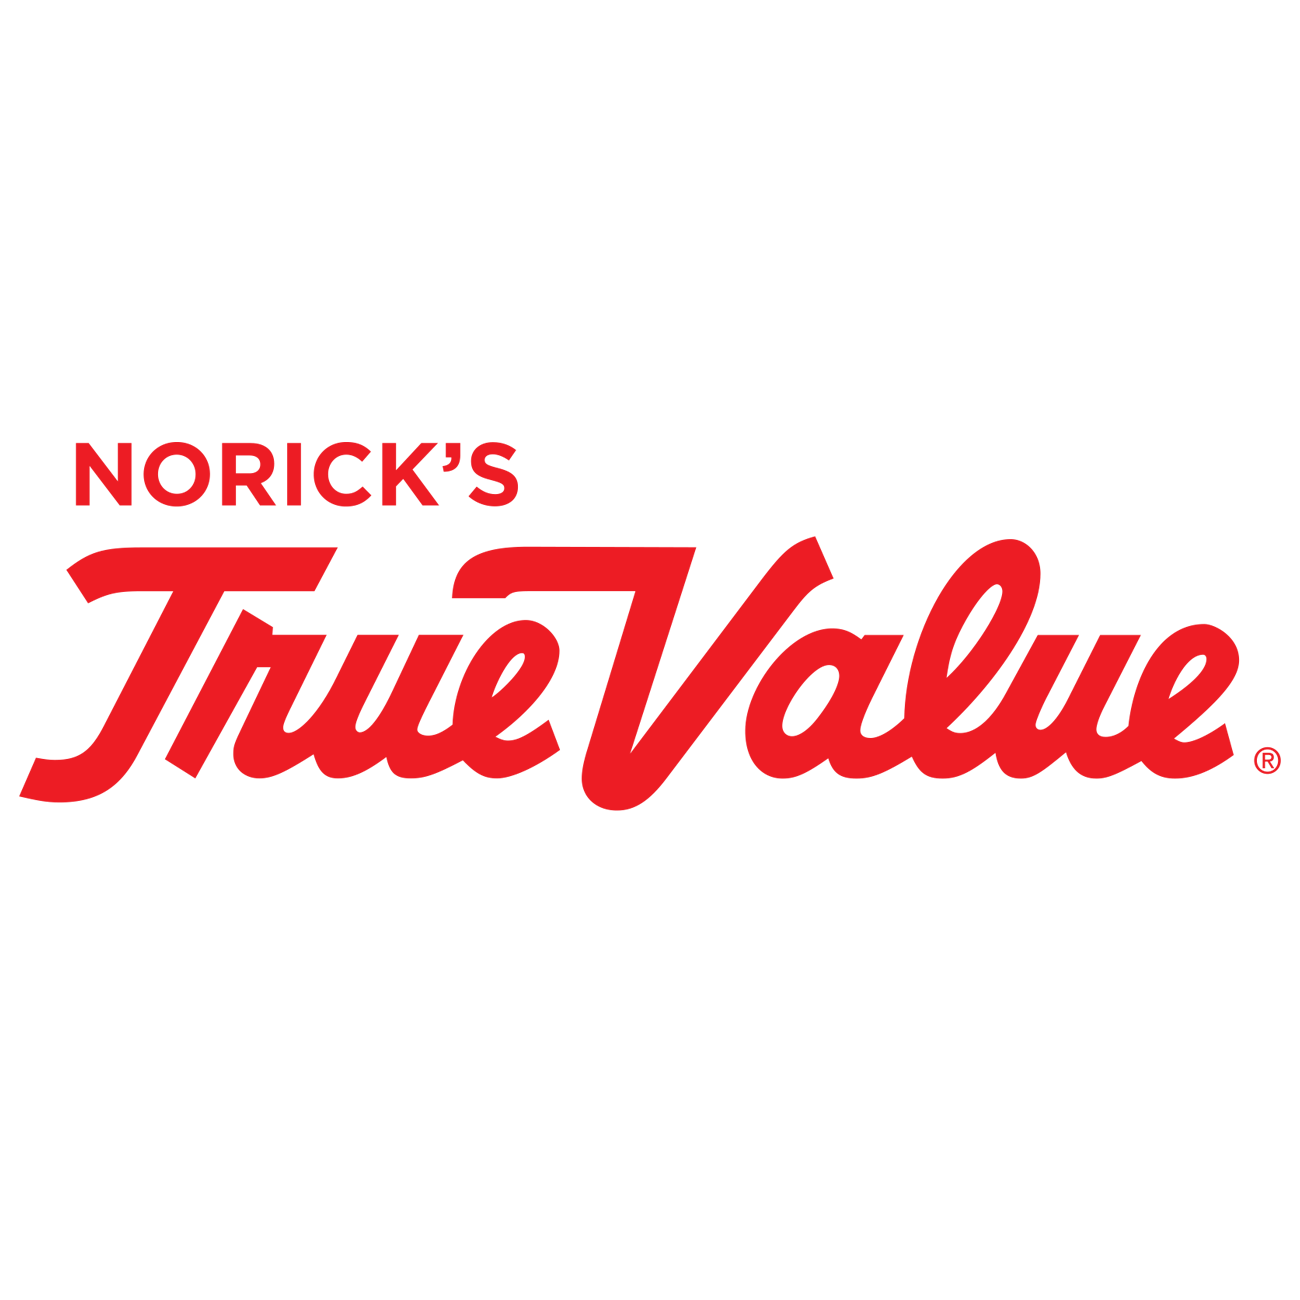 Norick's True Value